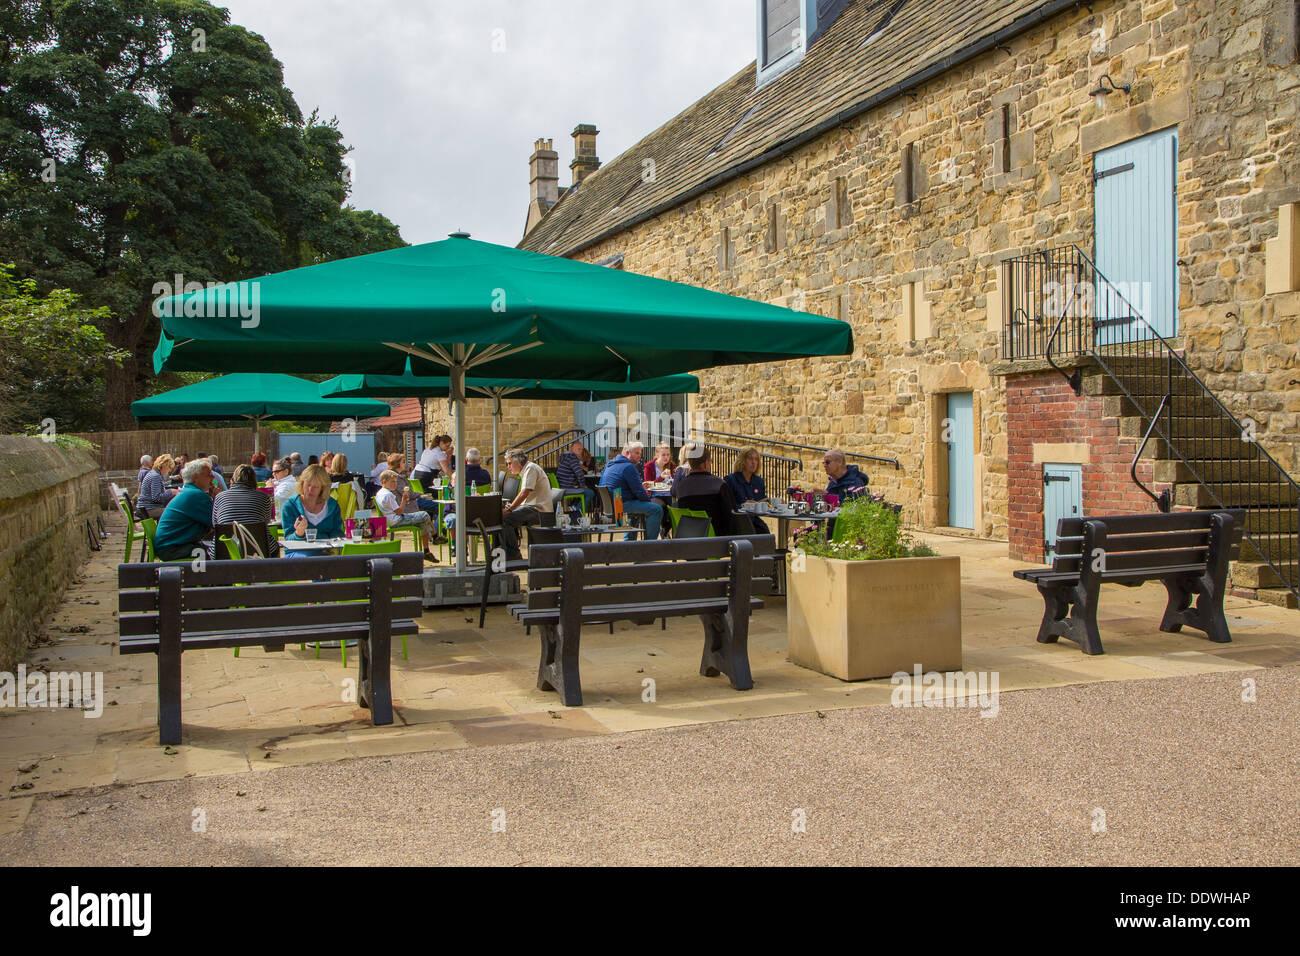 The Tea Room at Hardwick New Hall, Derbyshire, England. - Stock Image